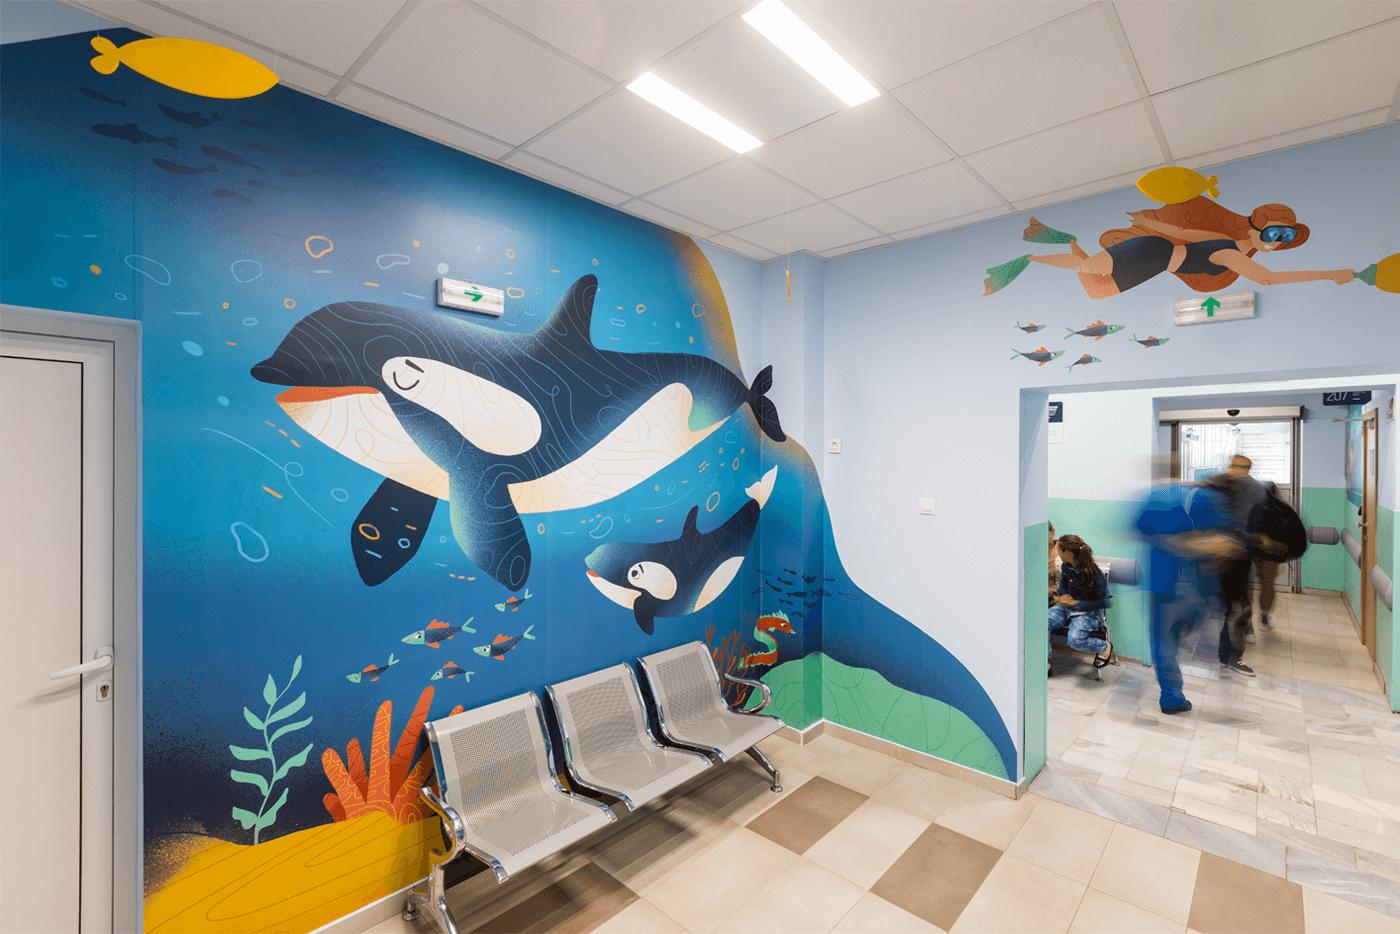 Pirogov 儿童病房环境图形设计©FourPlus Studio